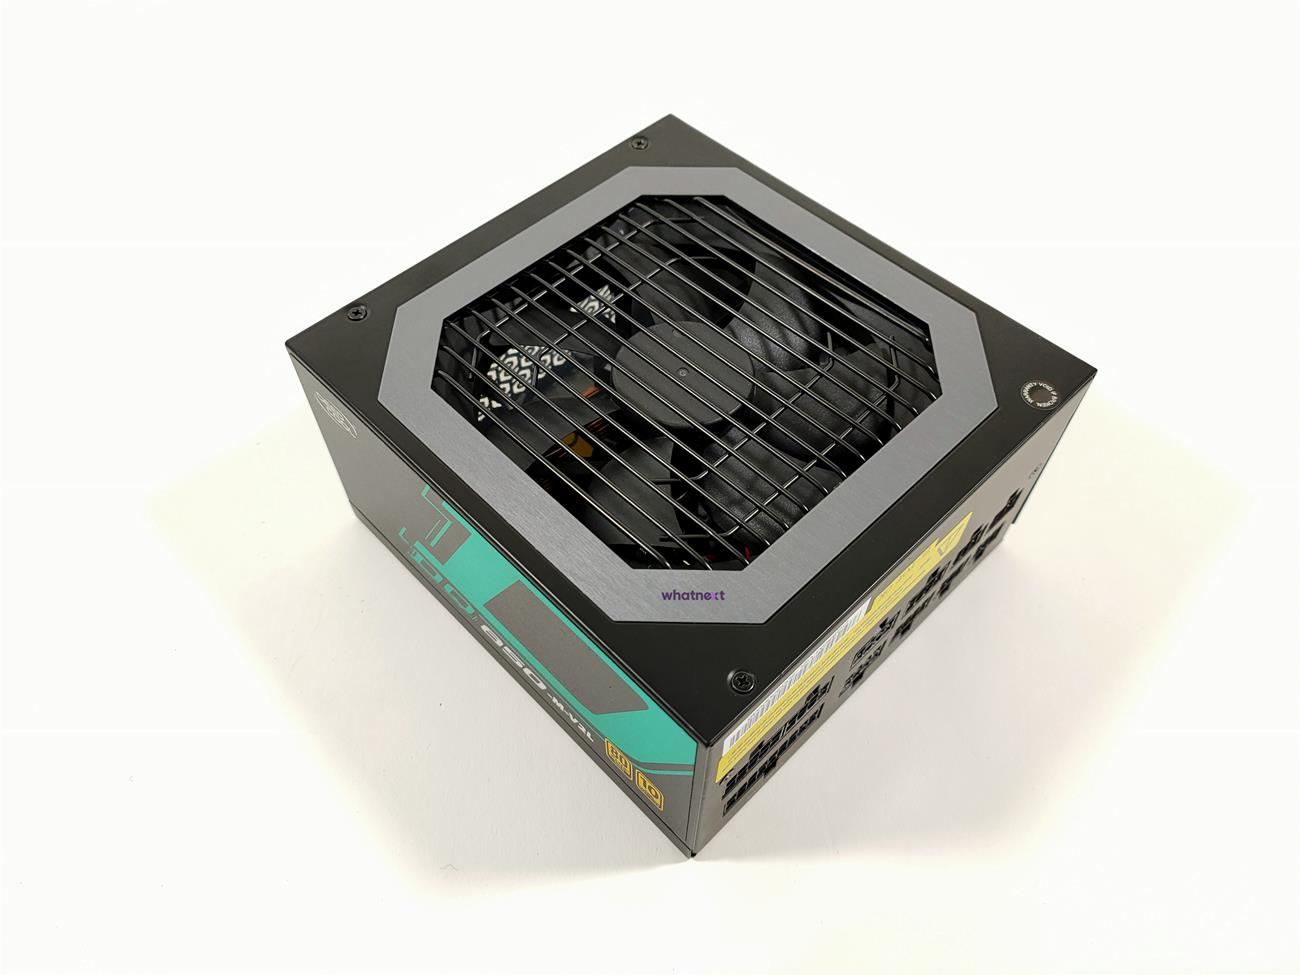 test Deepcool DQ850-M-V2L, recenzja Deepcool DQ850-M-V2L, review Deepcool DQ850-M-V2L, opinia Deepcool DQ850-M-V2L